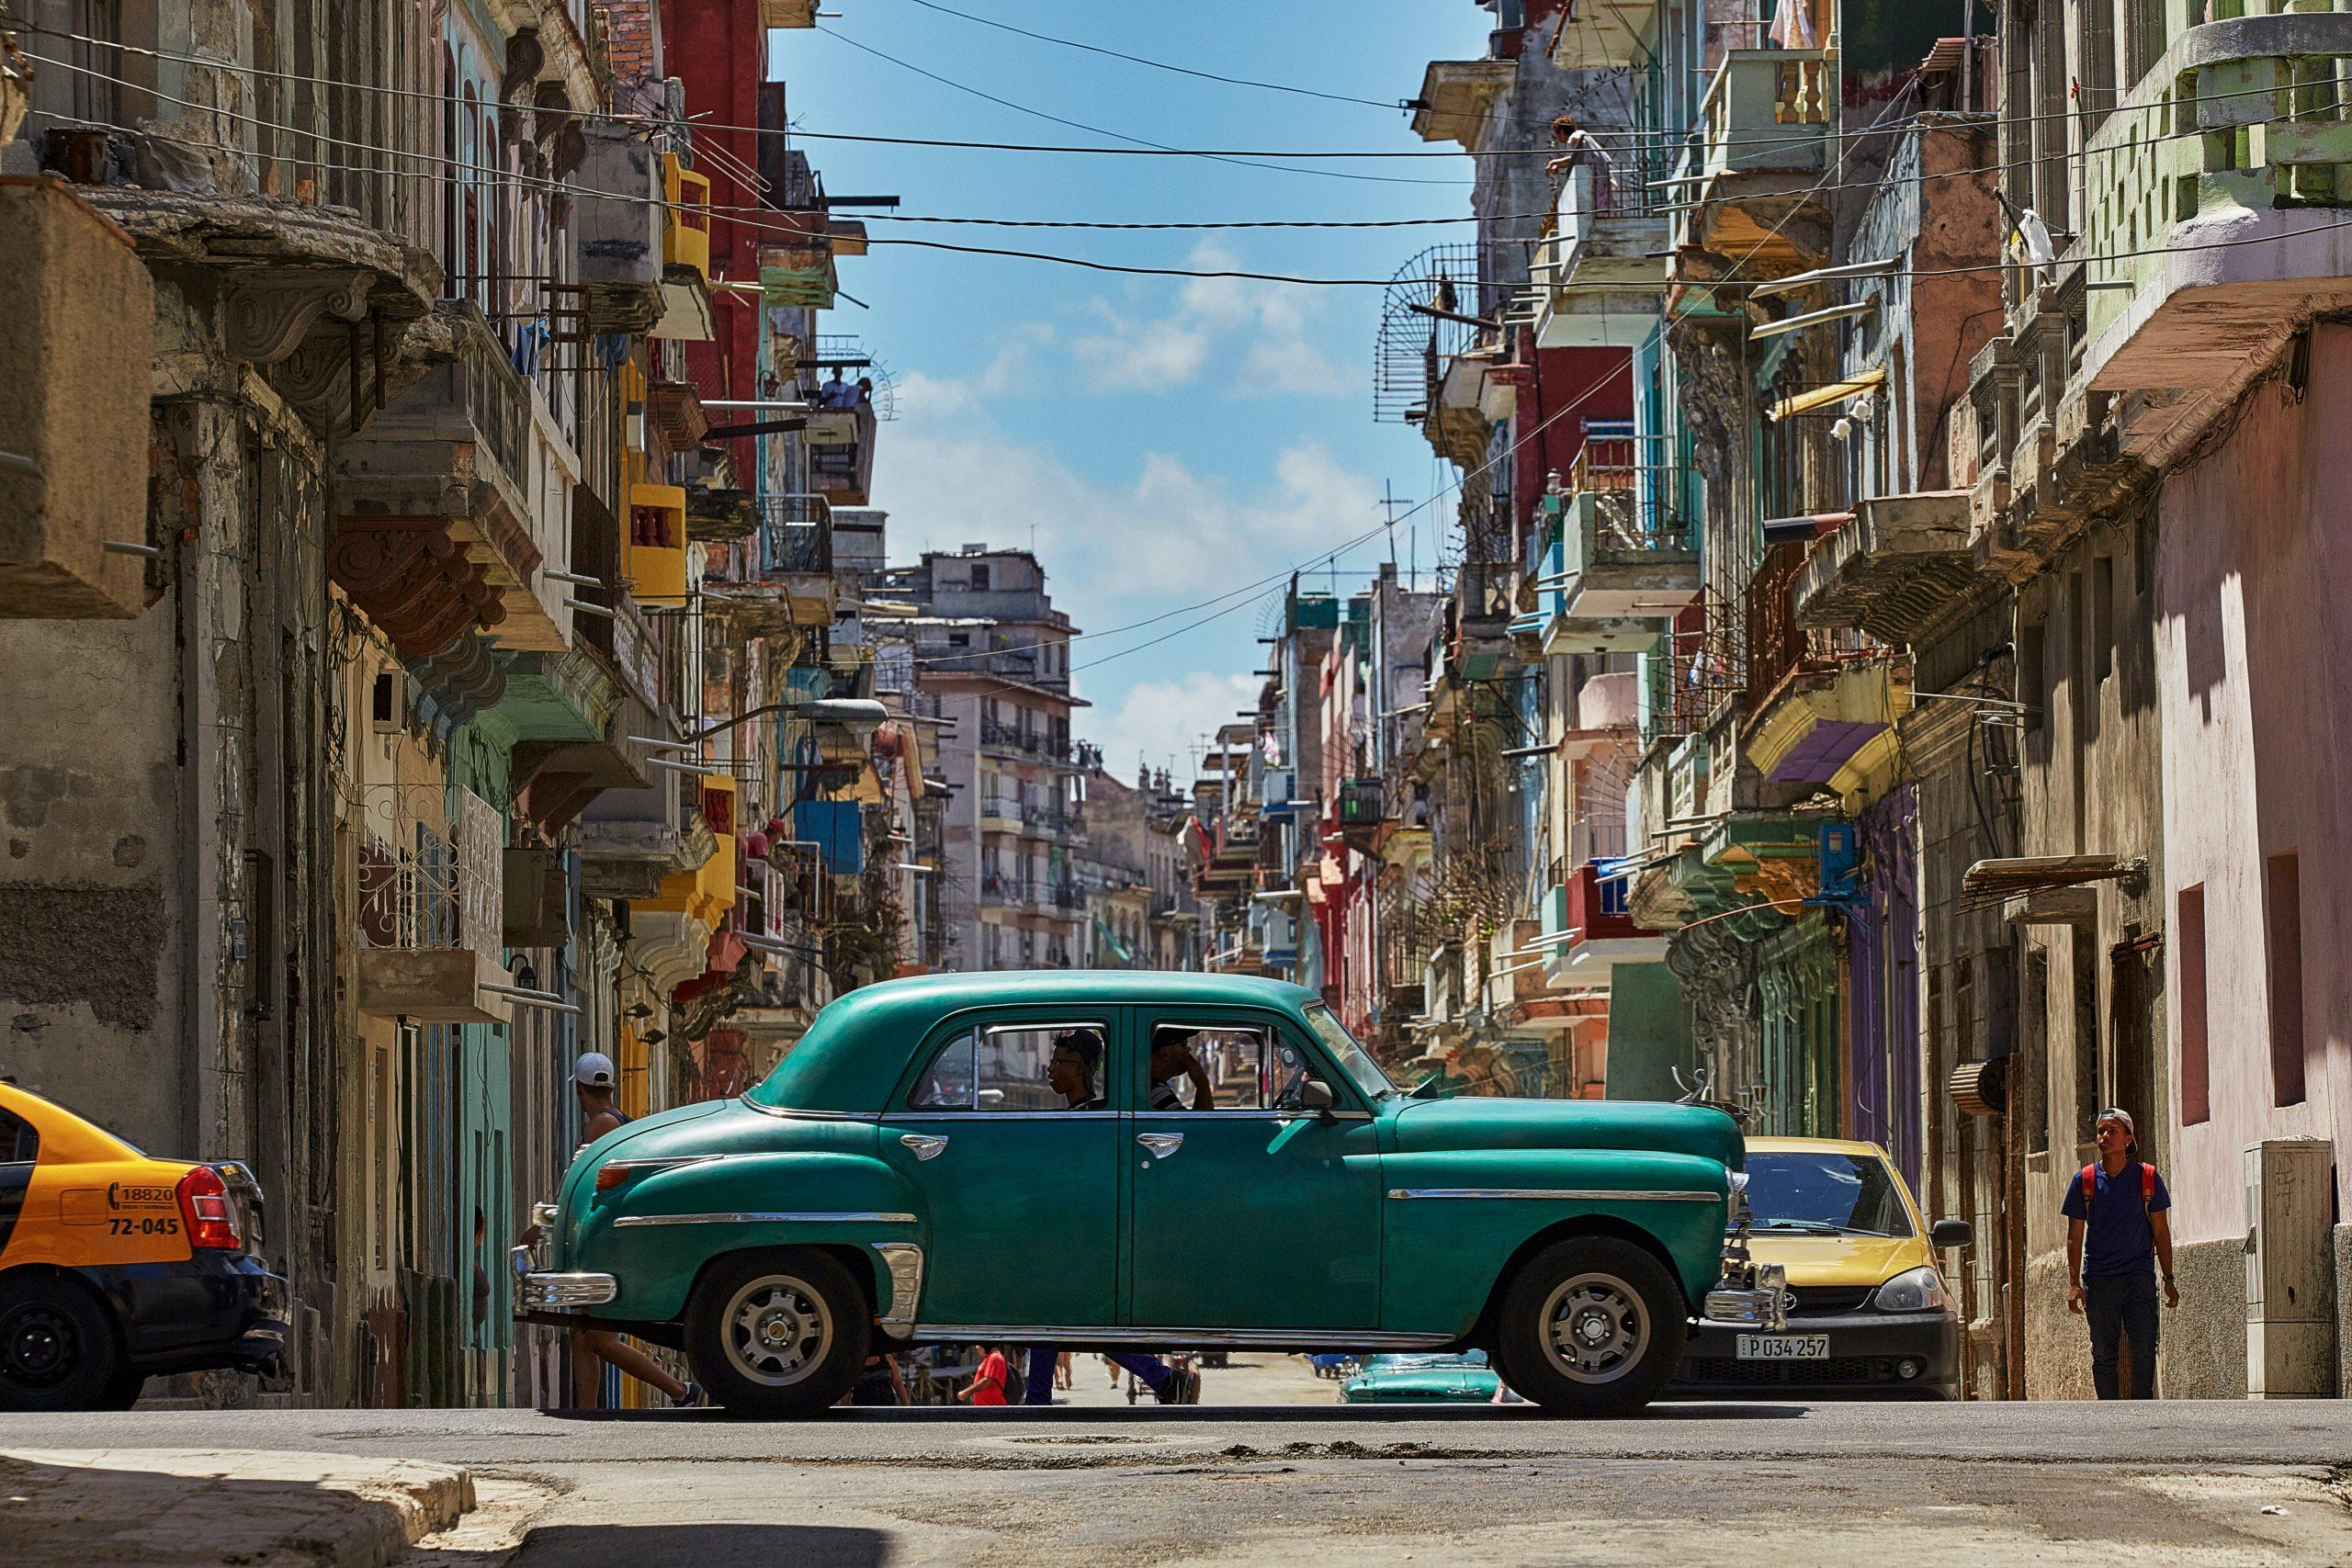 Oldtimer crossing one of Havanna's main streets